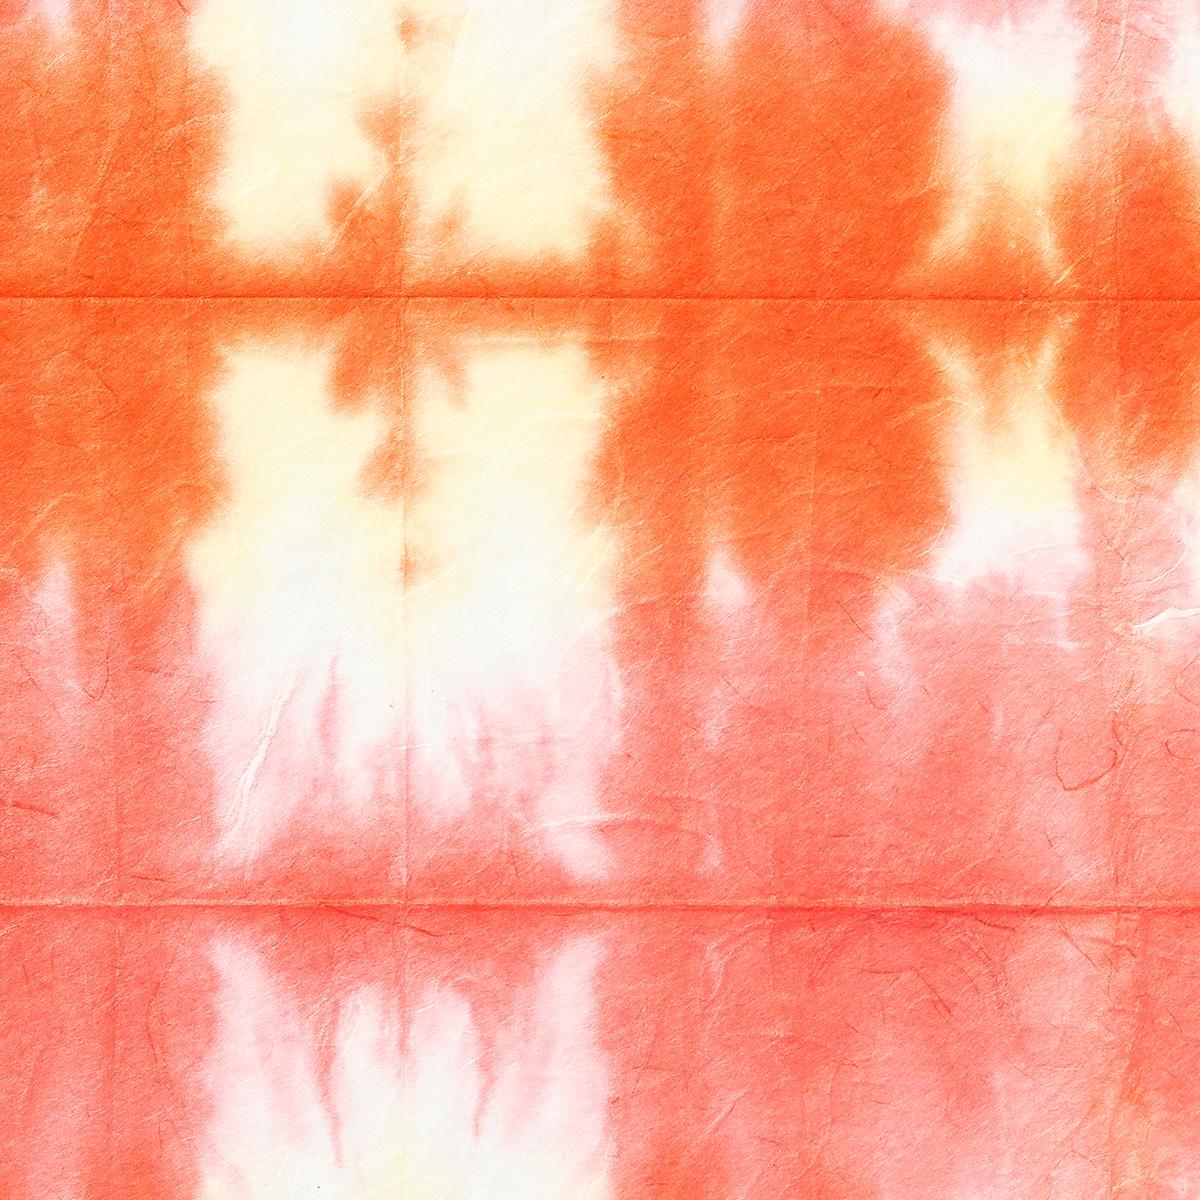 楮6匁 雲竜紙 板締め No.5